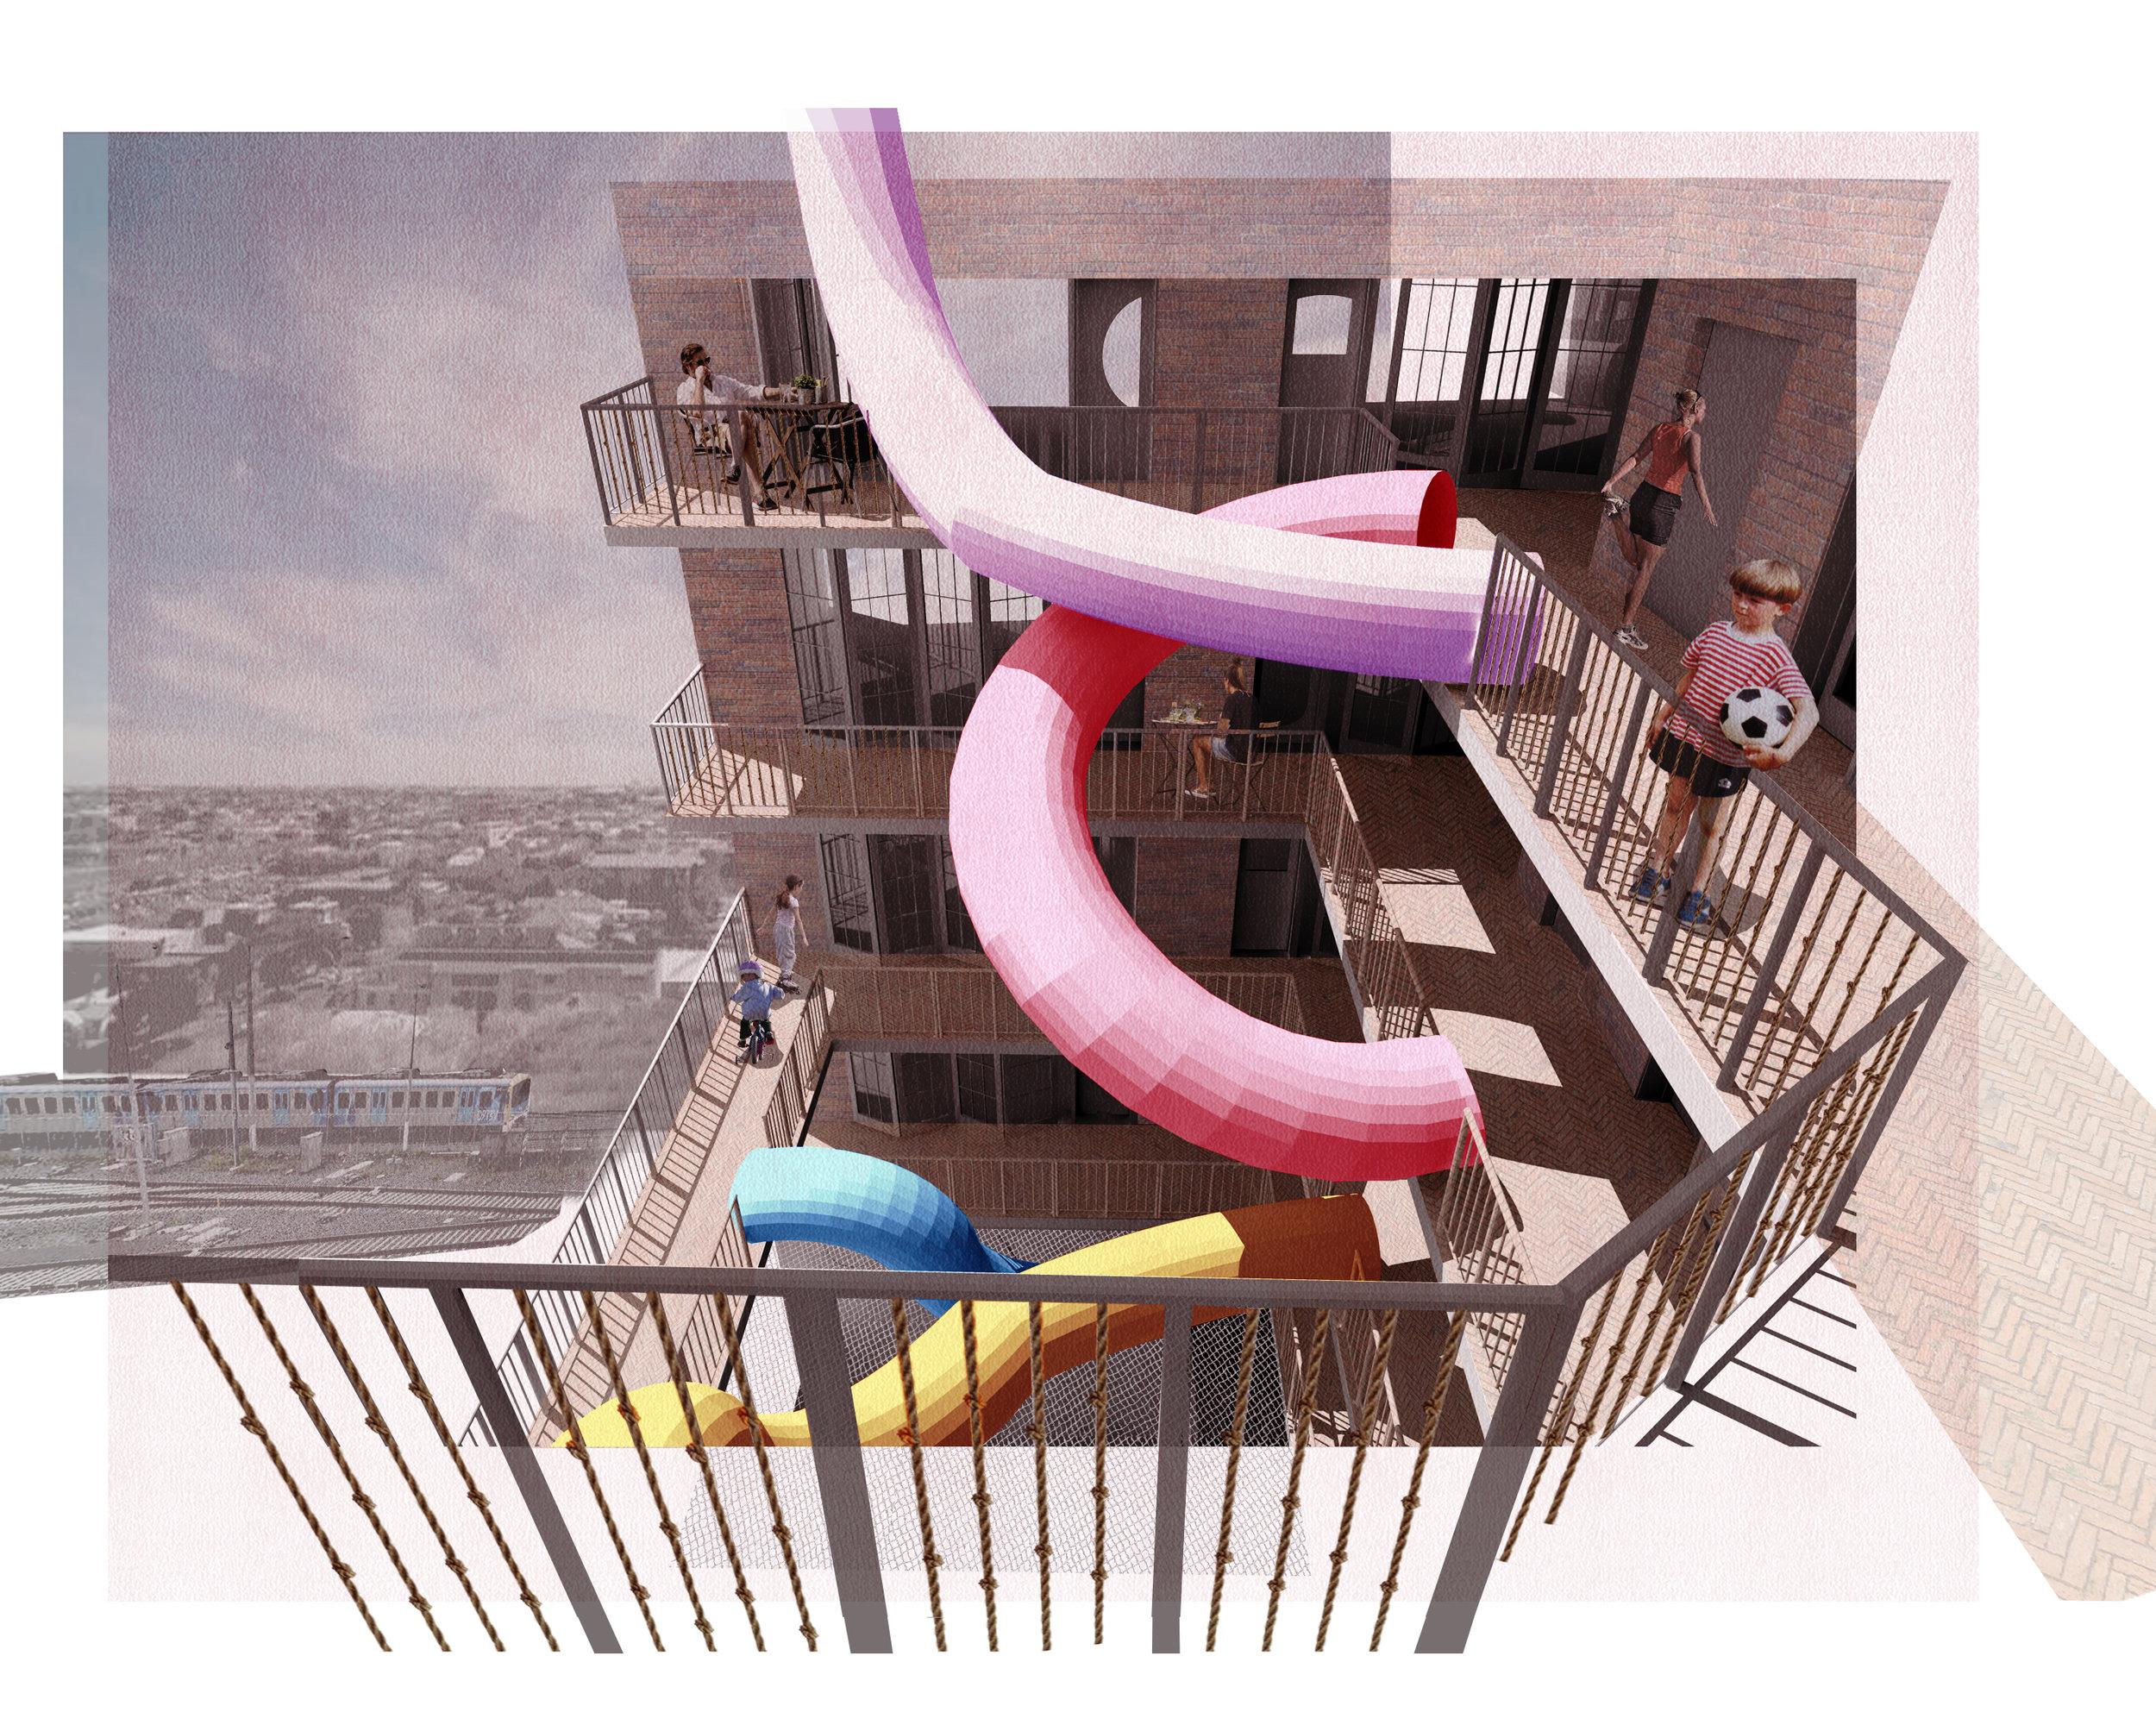 The vertical playground